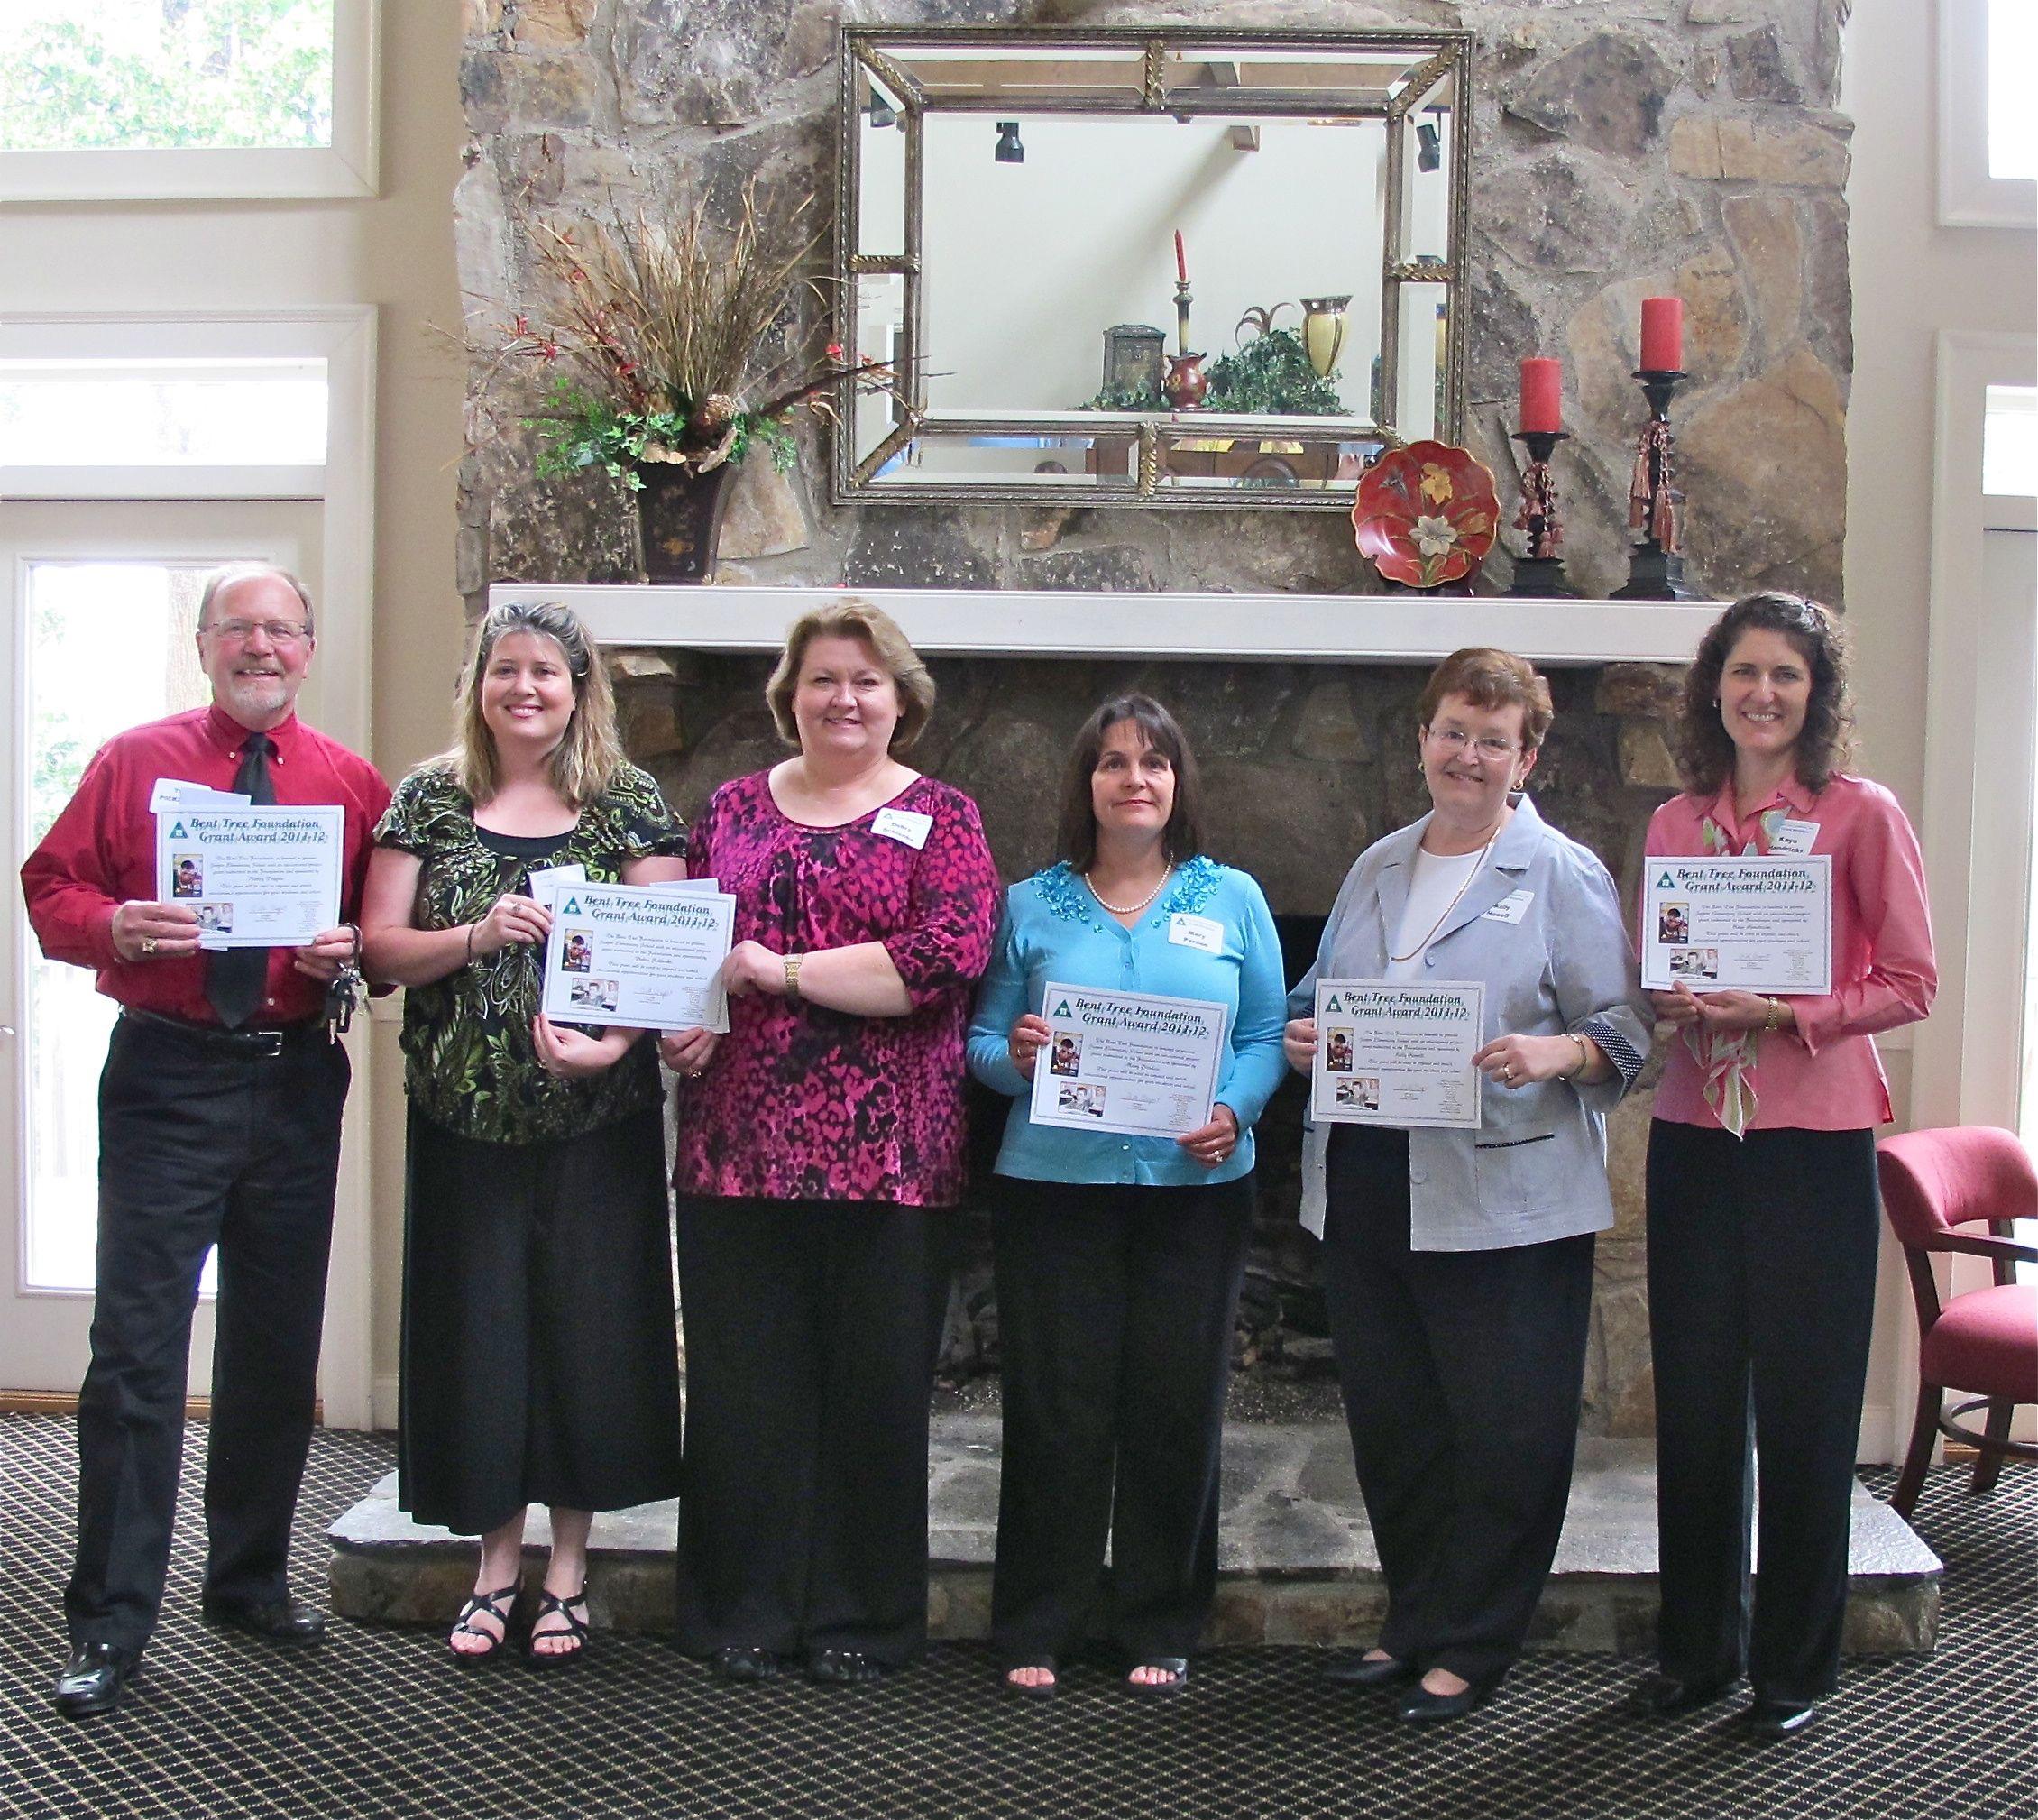 2011 Scholarship/Grant Reception - Bent Tree Foundation